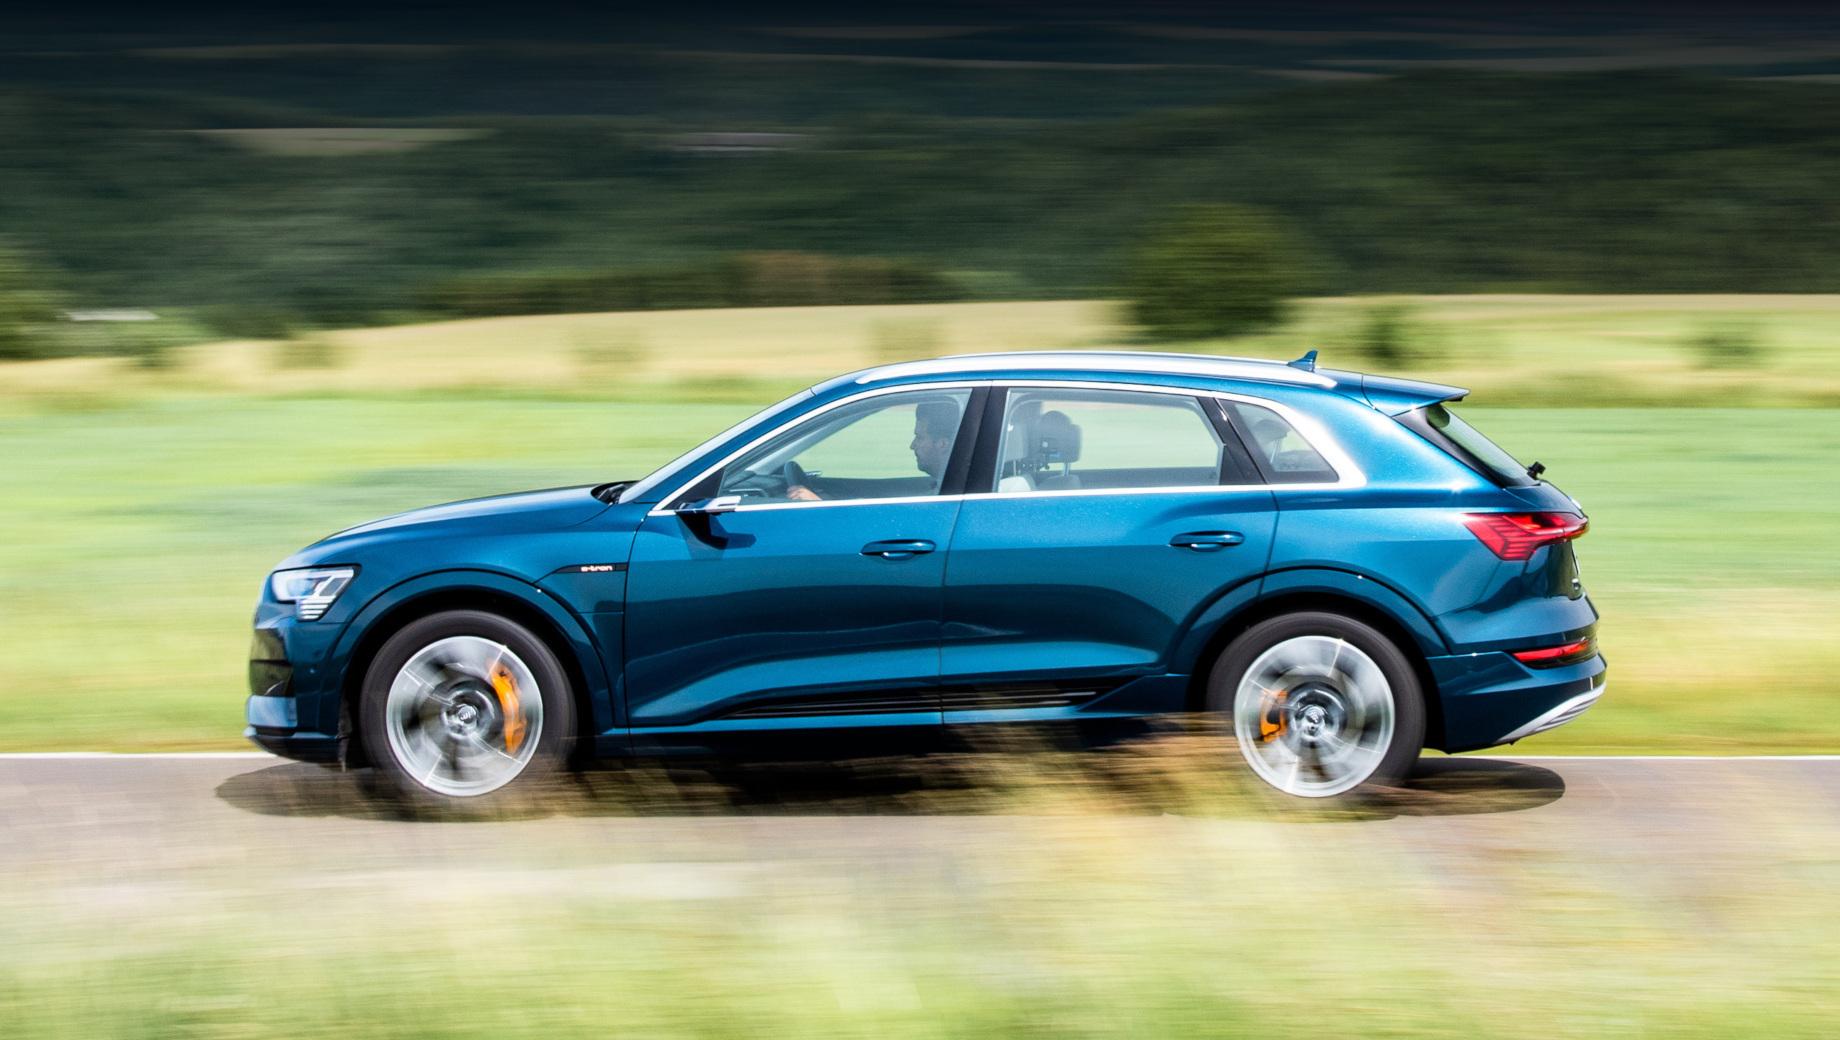 Стартовали продажи электрокара Audi e-tron в России